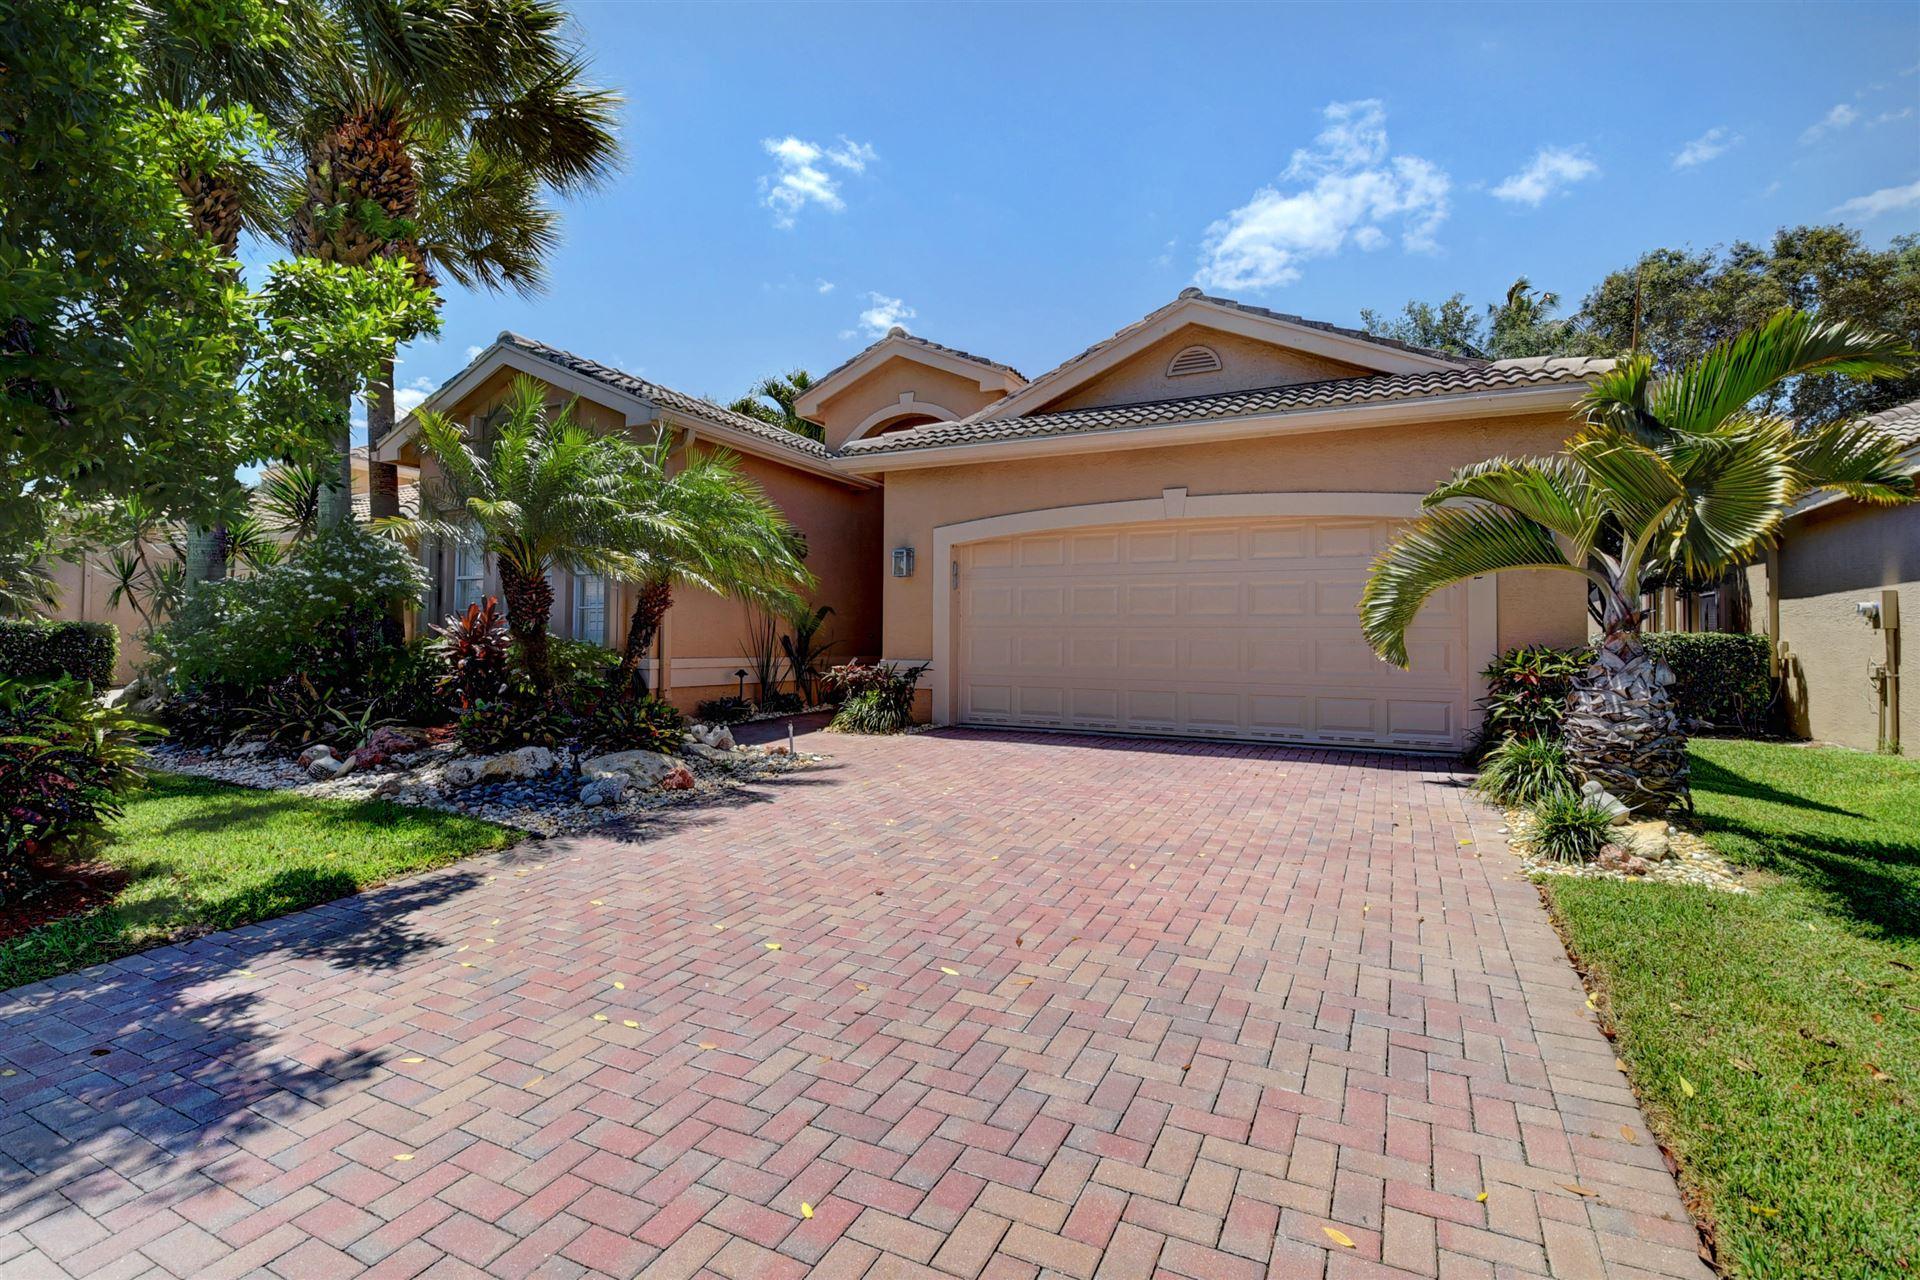 7412 Twin Falls Drive, Boynton Beach, FL 33437 - #: RX-10663900